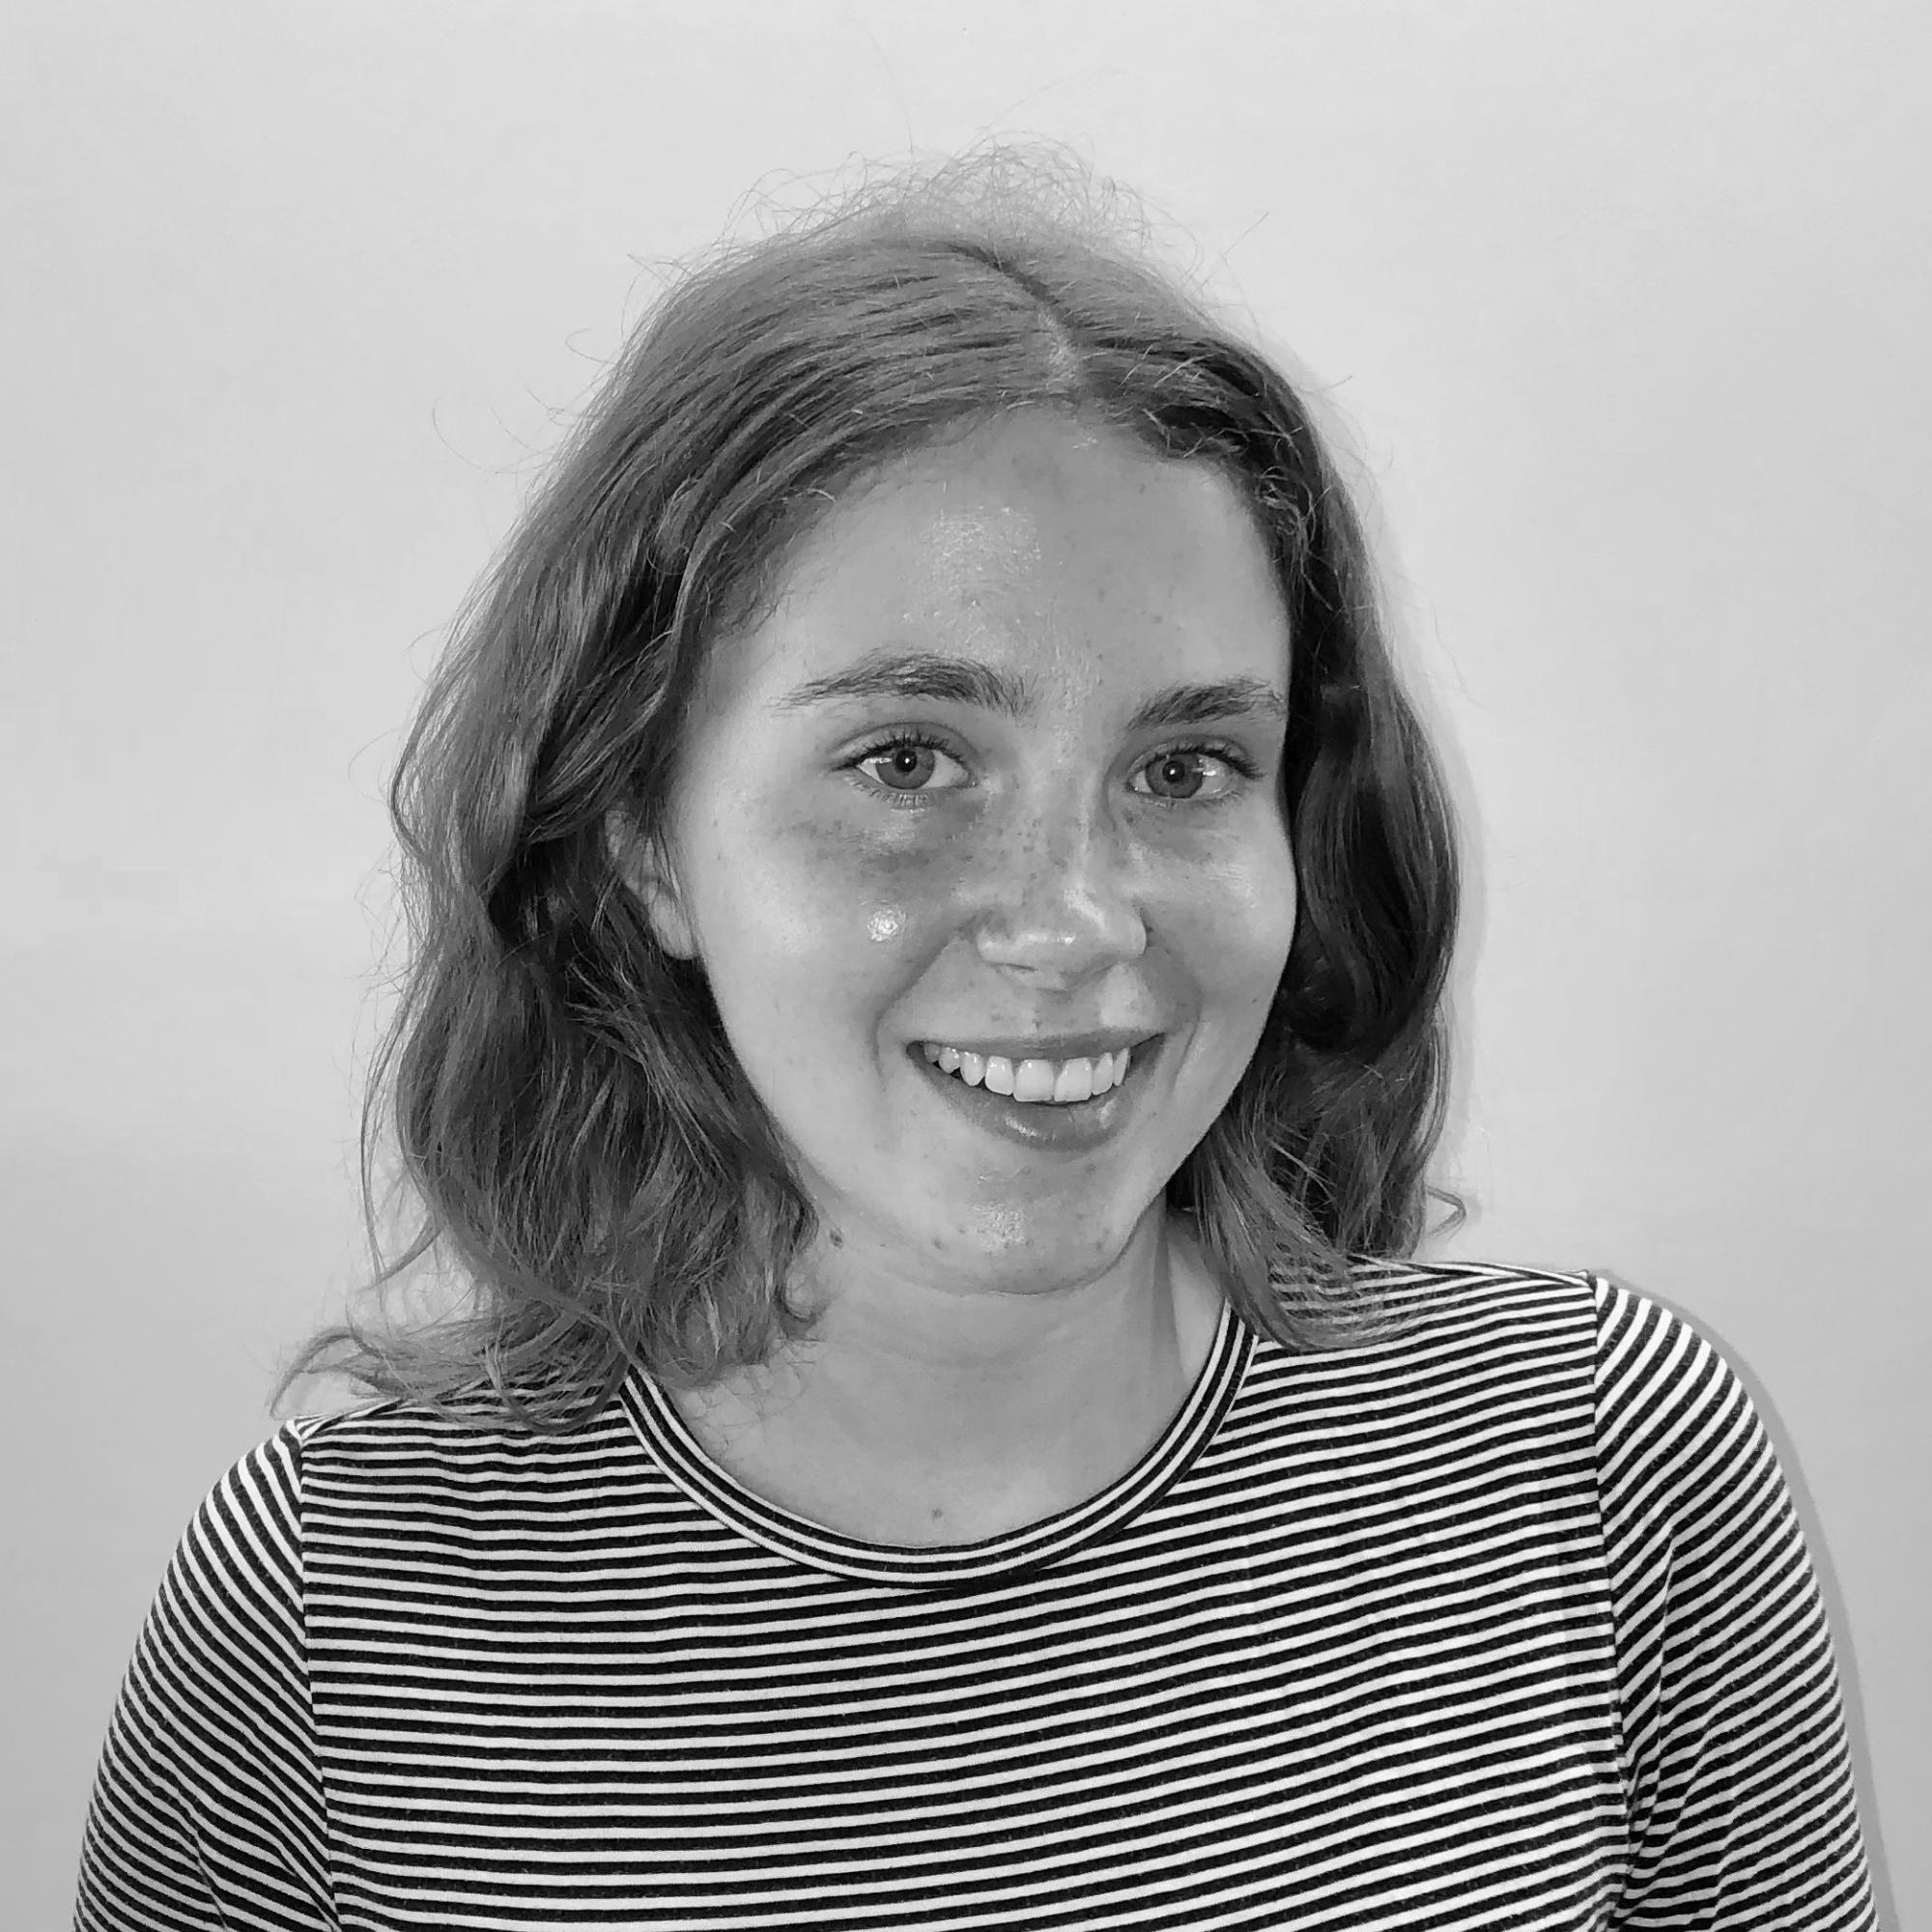 Louise Dubois, data-science assistant